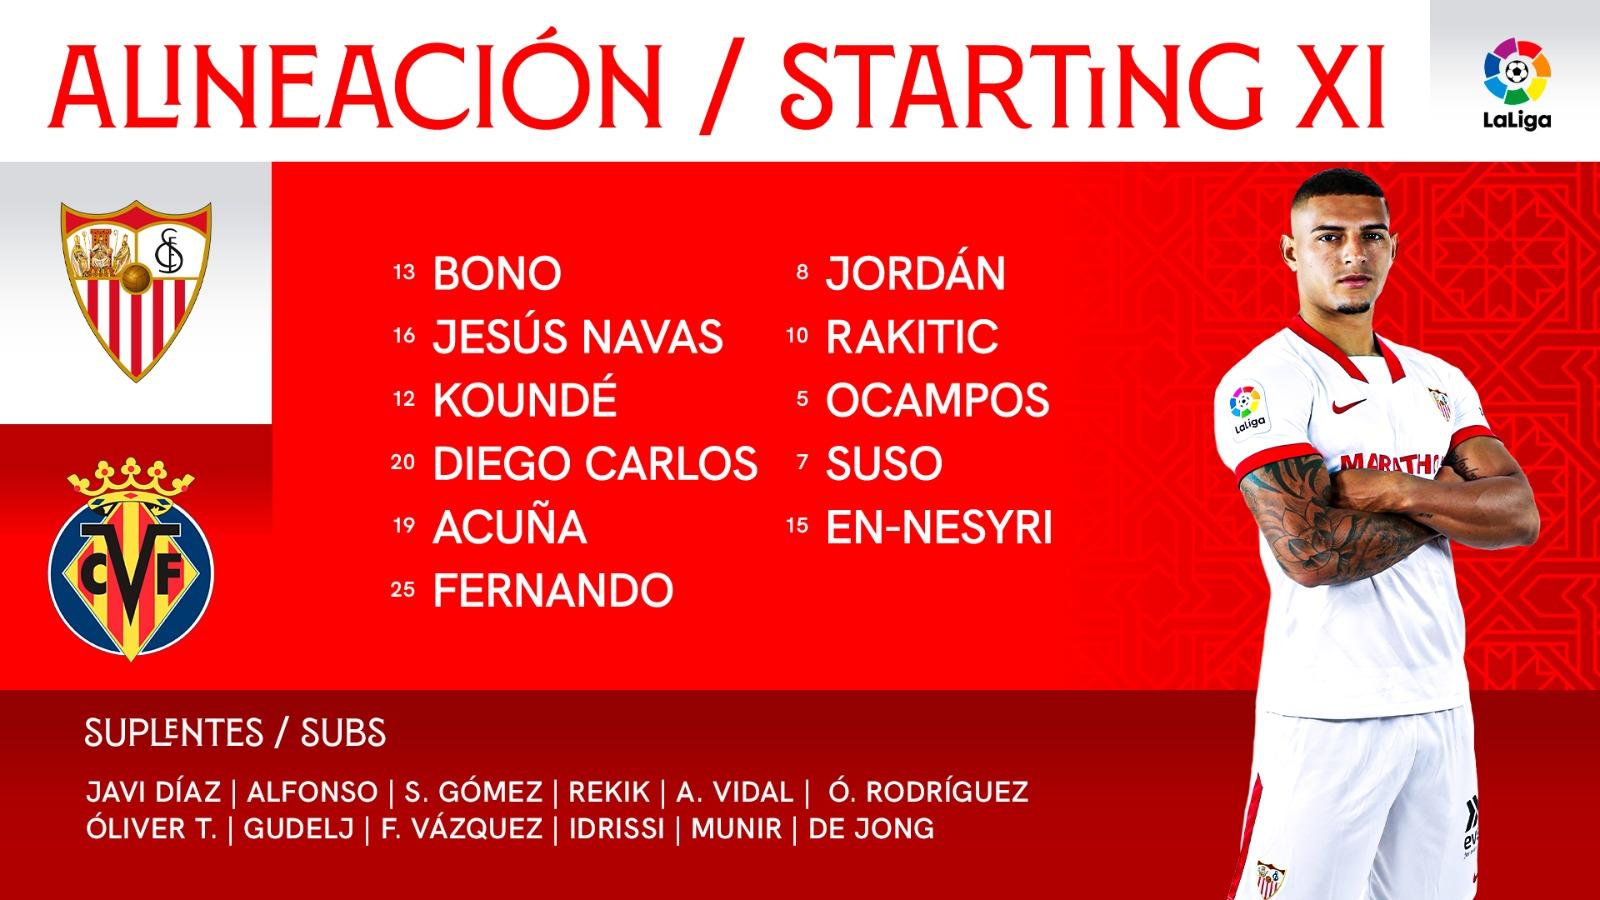 El hilo del Sevilla - Página 10 EqaZTOsXEAEZR-G?format=jpg&name=large